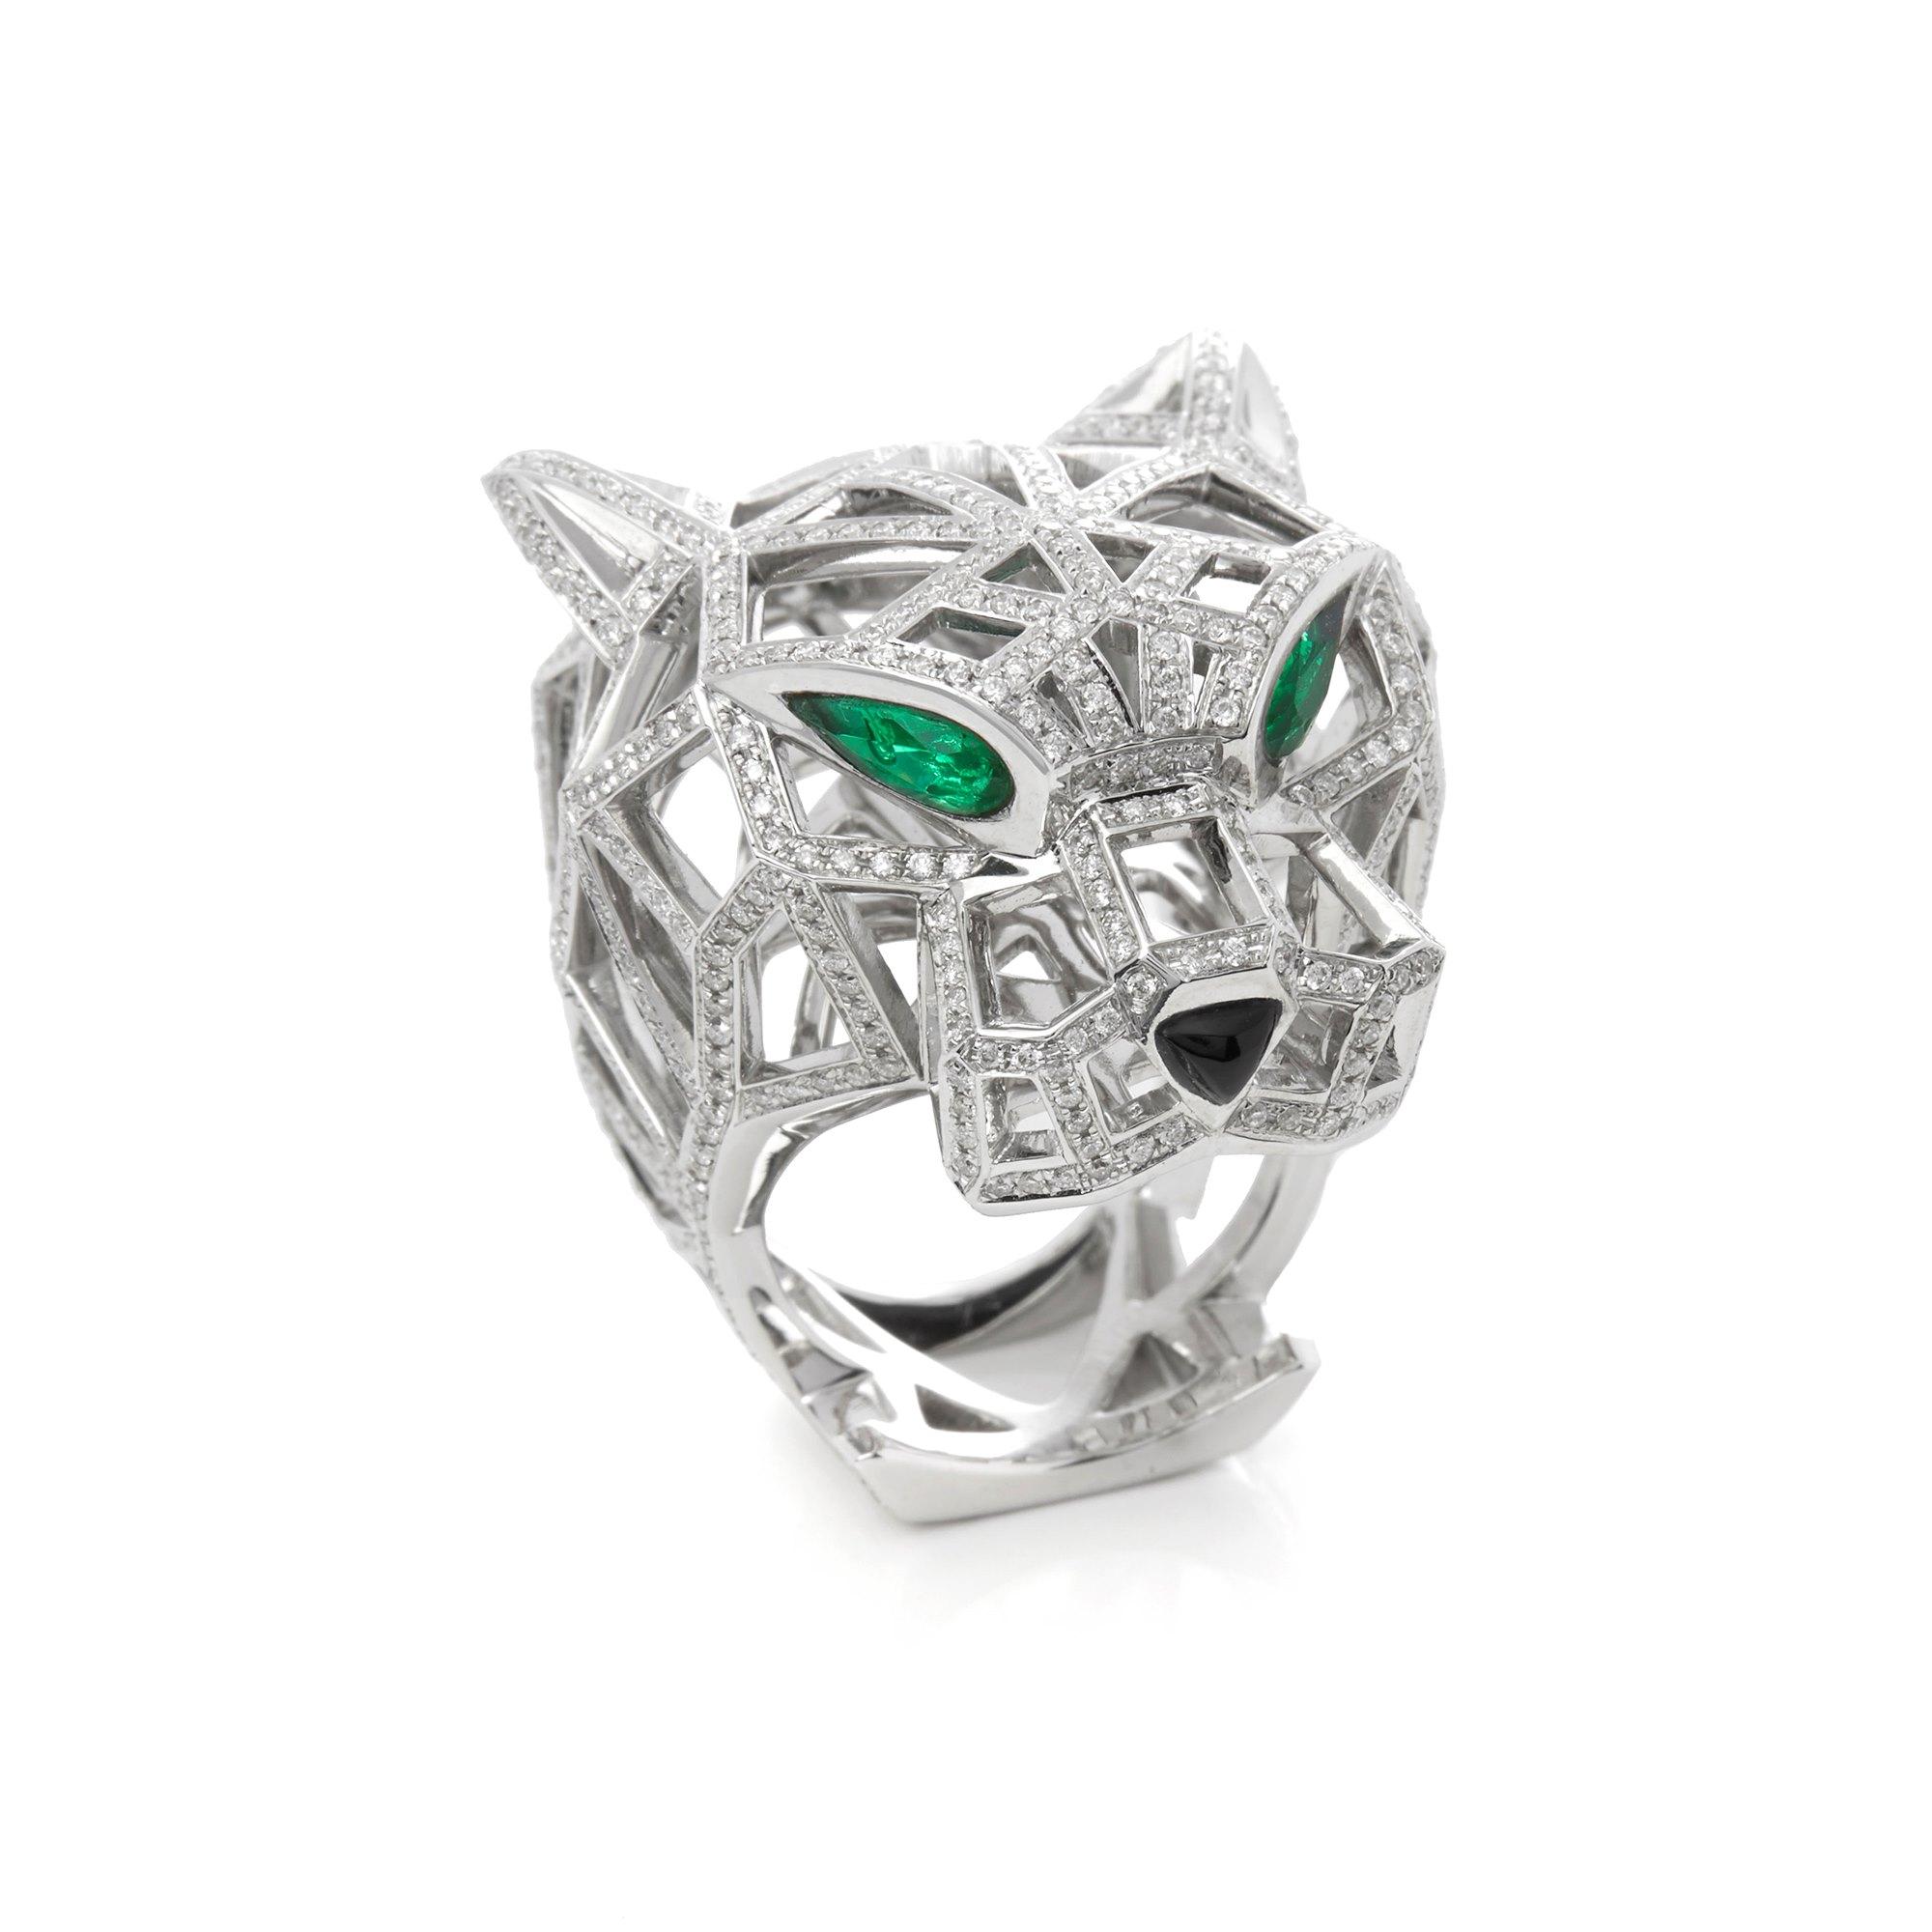 Cartier 18k White Gold Diamond, Emerald & Onyx Panthère Ring